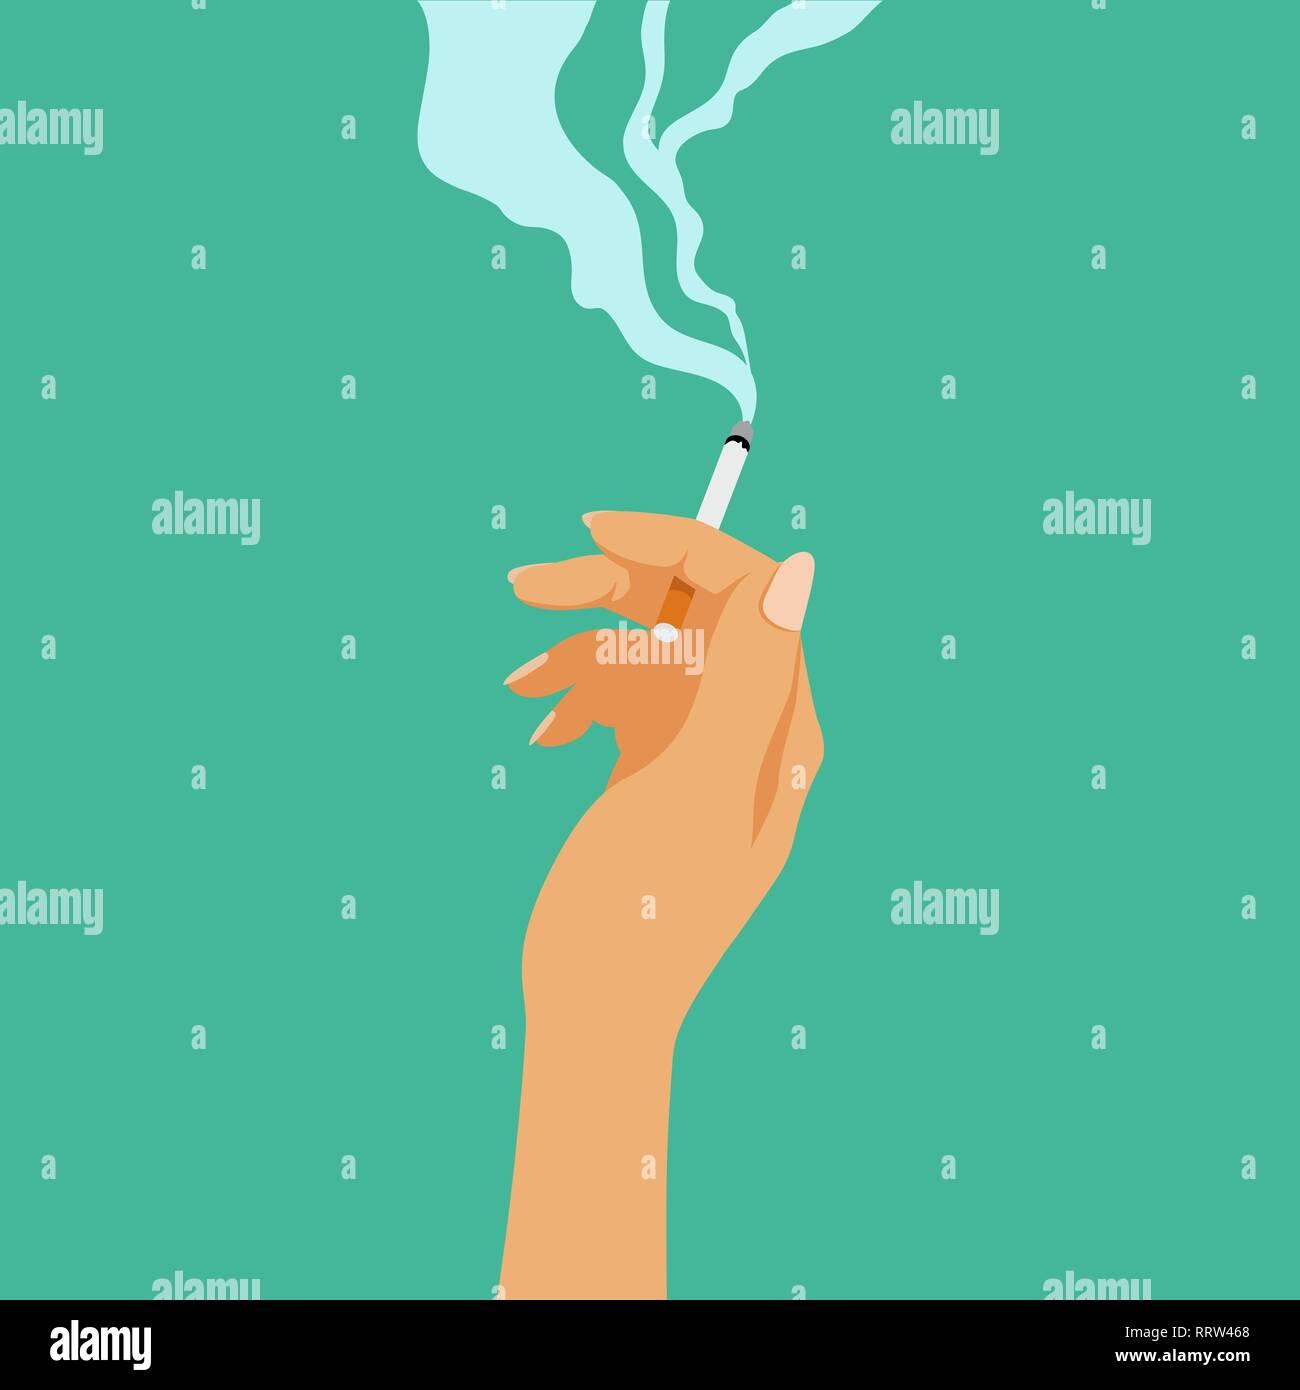 Smoking addiction concept, cigarette in hand, bad habit - Stock Image